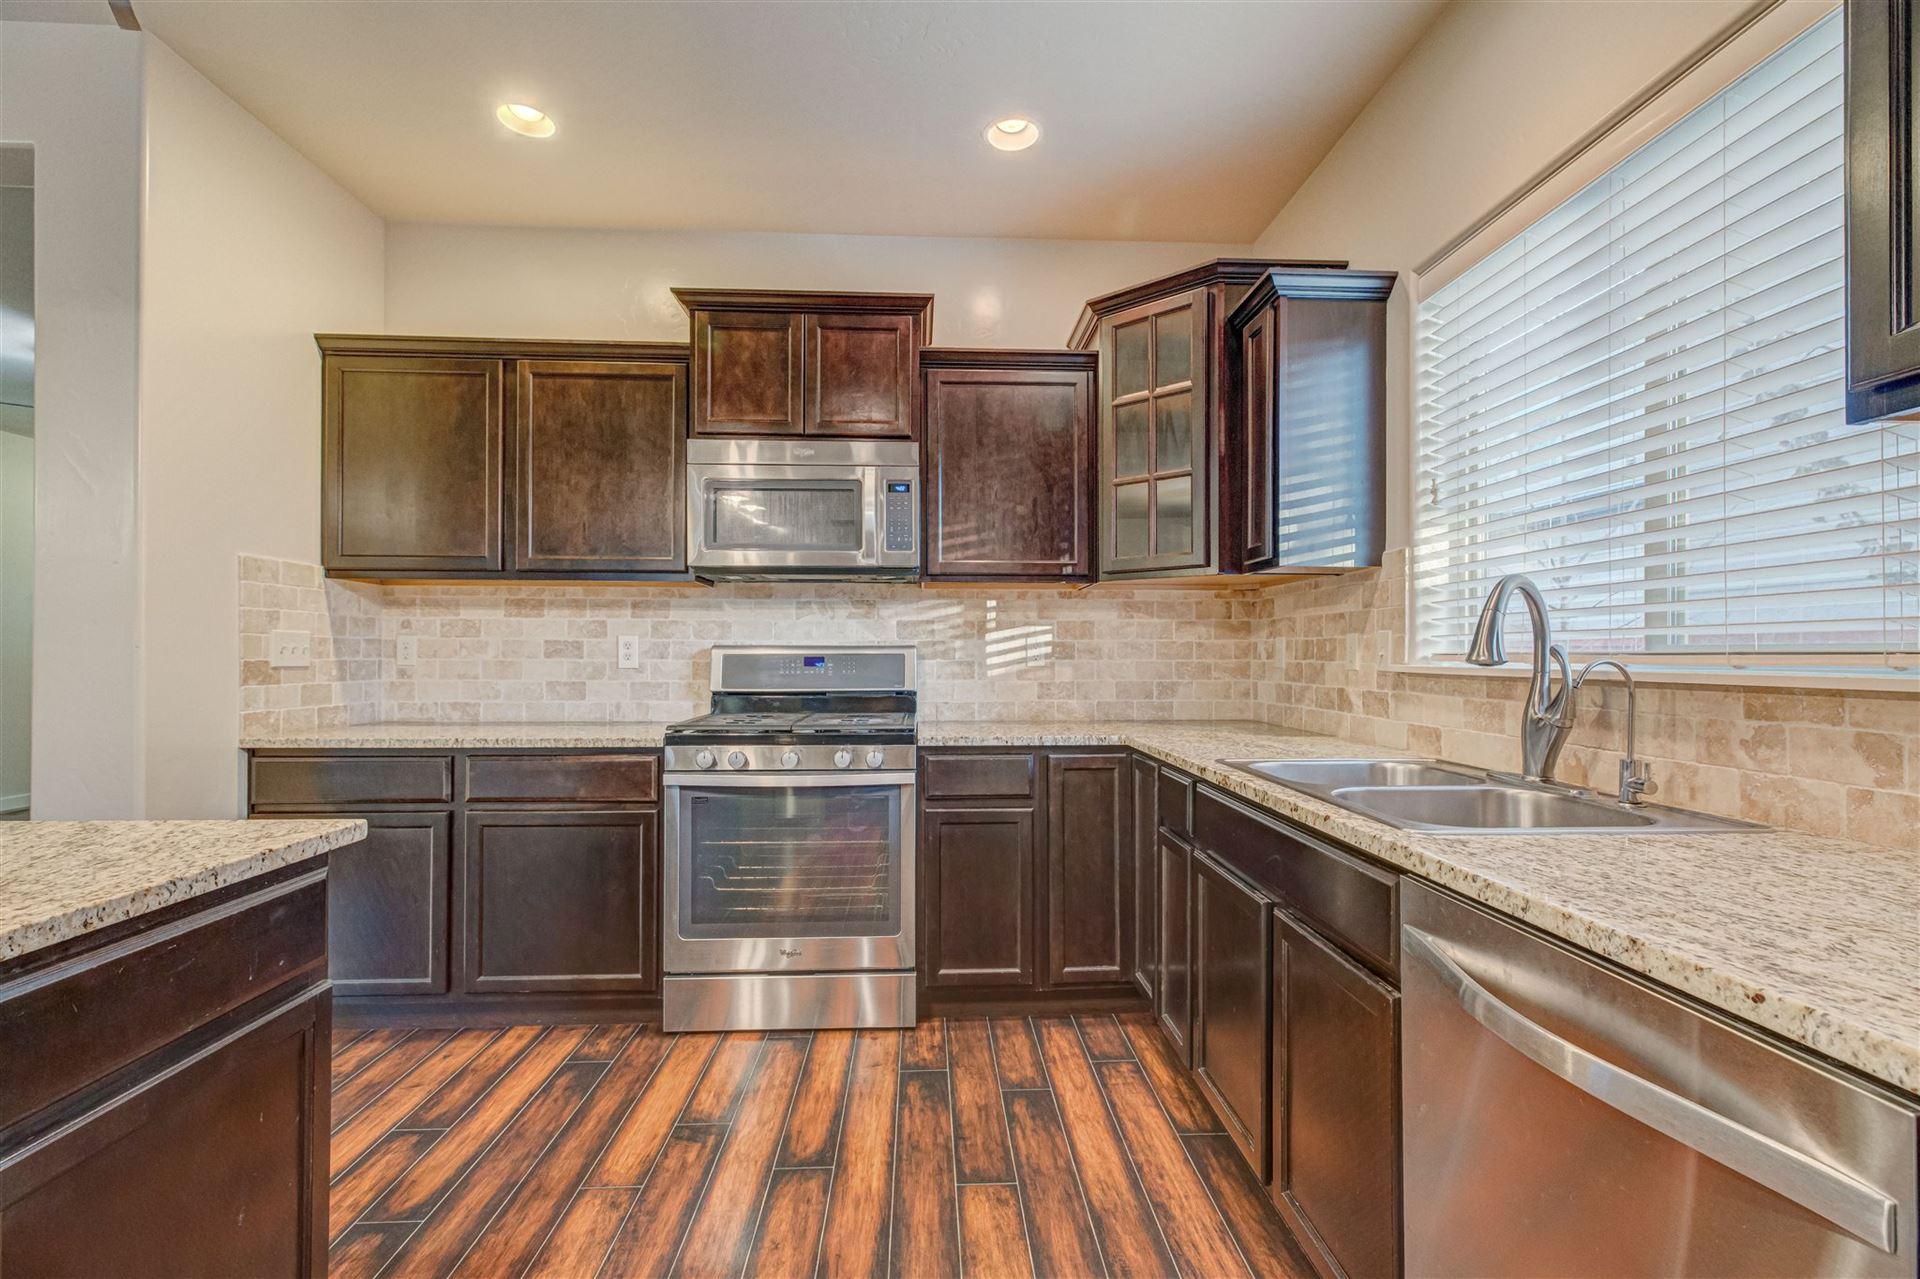 Photo of 4483 S Old Sport Lane, Boise, ID 83716 (MLS # 98787610)